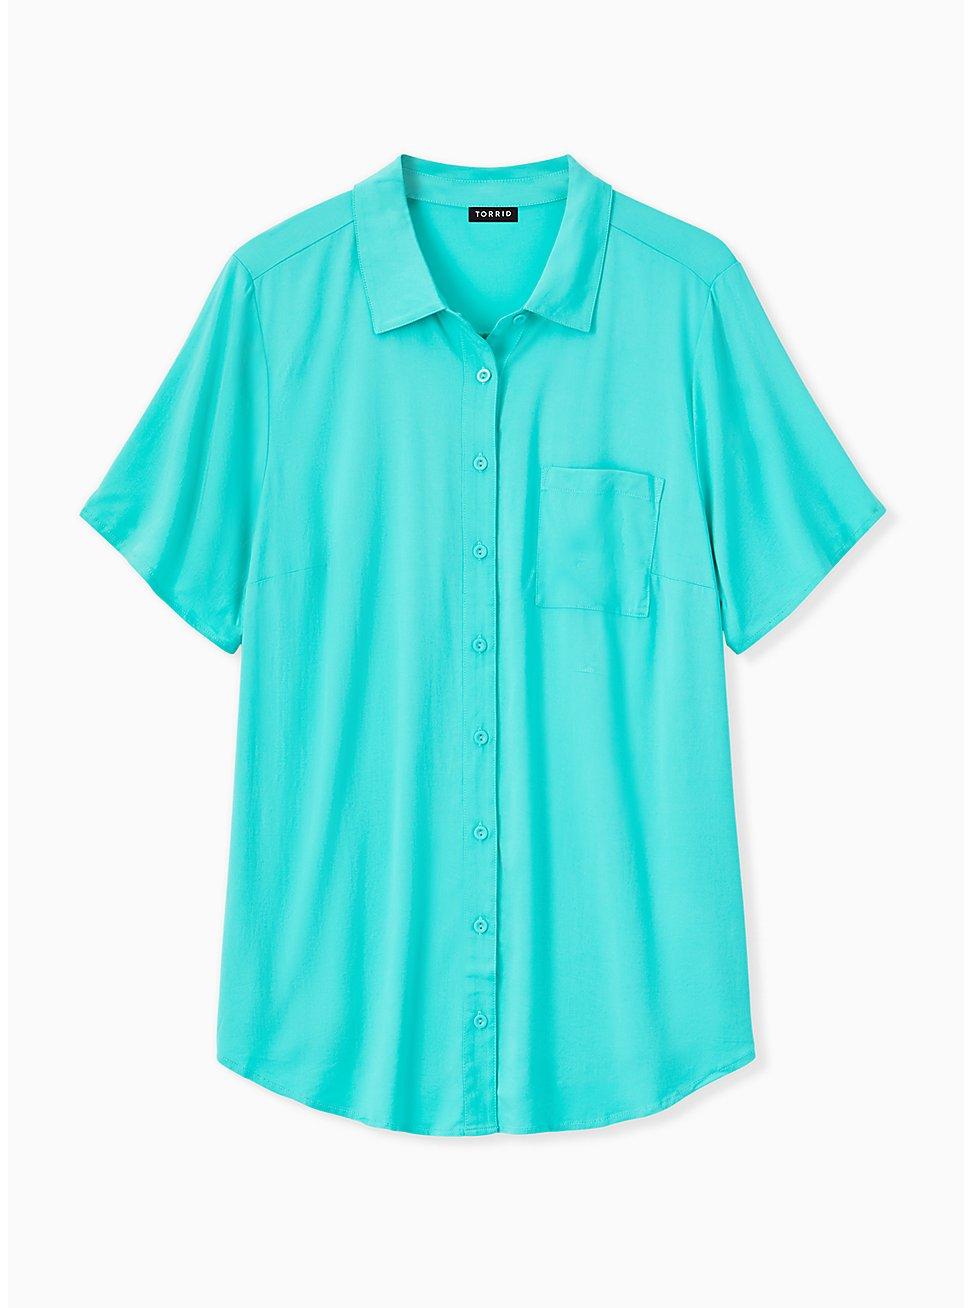 Turquoise Challis Button Front Shirt, AQUA GREEN, hi-res